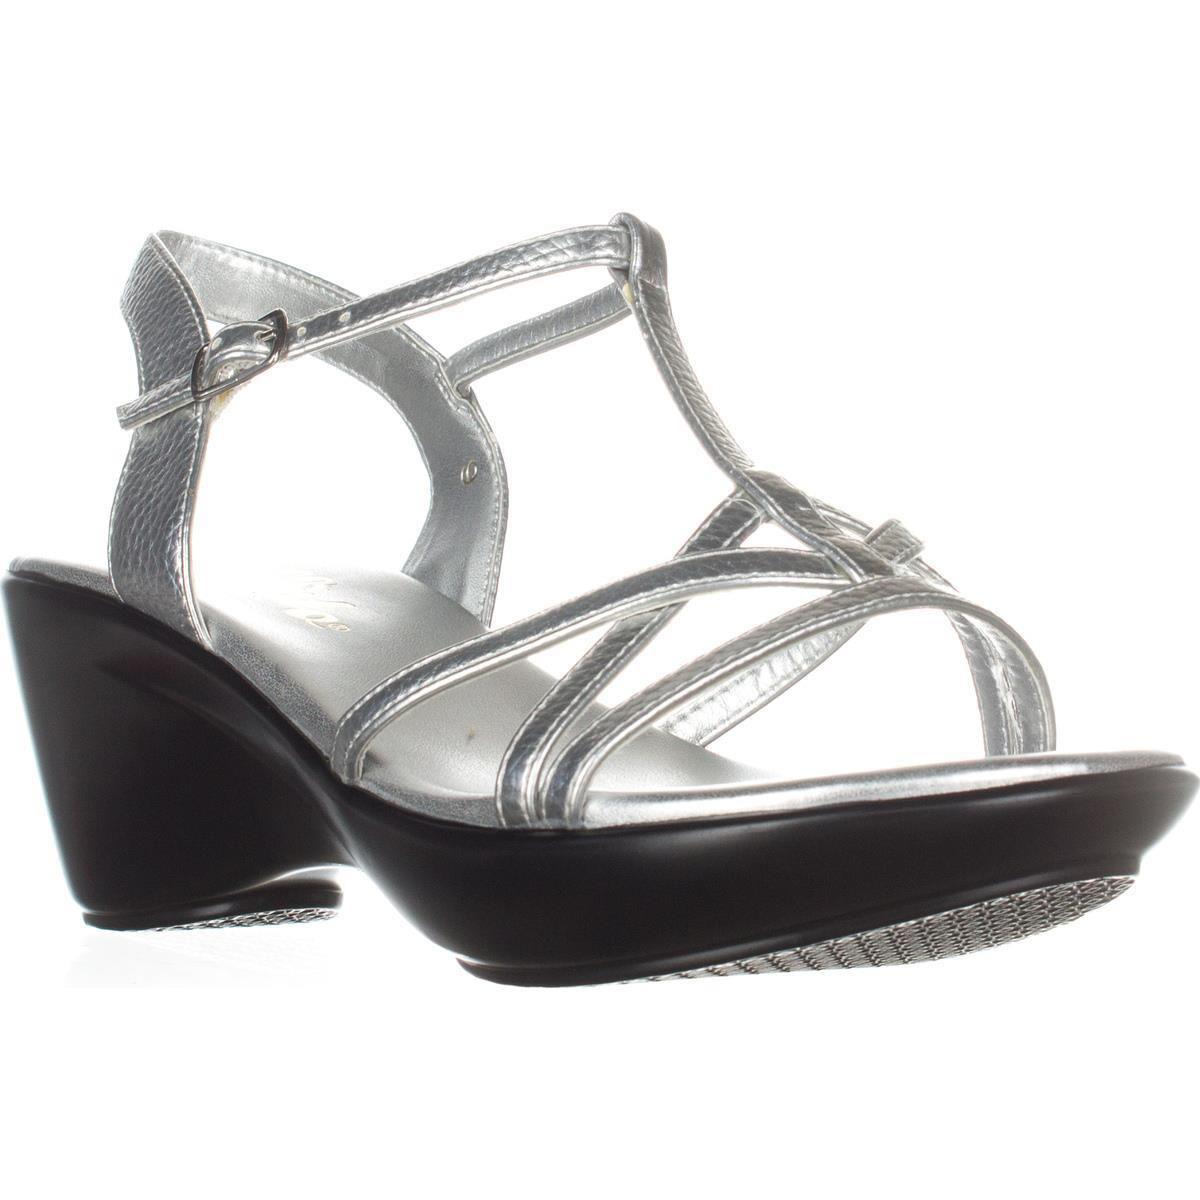 367fdf53cde9 Callisto. Women s Metallic Caressa Wedge Dress Sandals